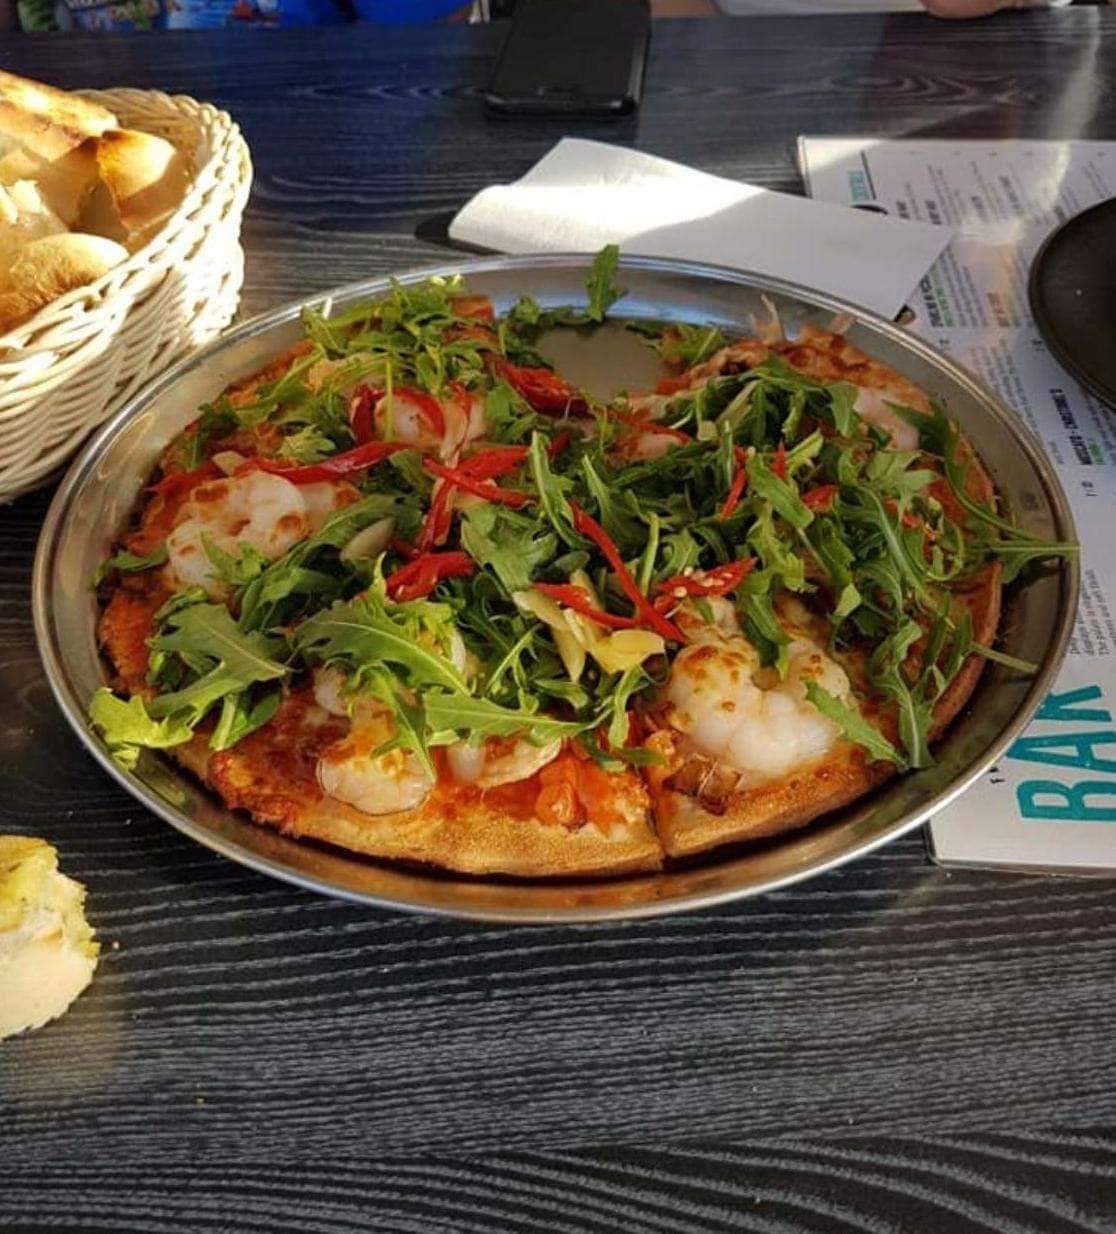 Fratellis Pizza & Pasta Family Restaurant | 227 Cranbourne Road, Frankston, Victoria 3199 | +61 3 9776 5277